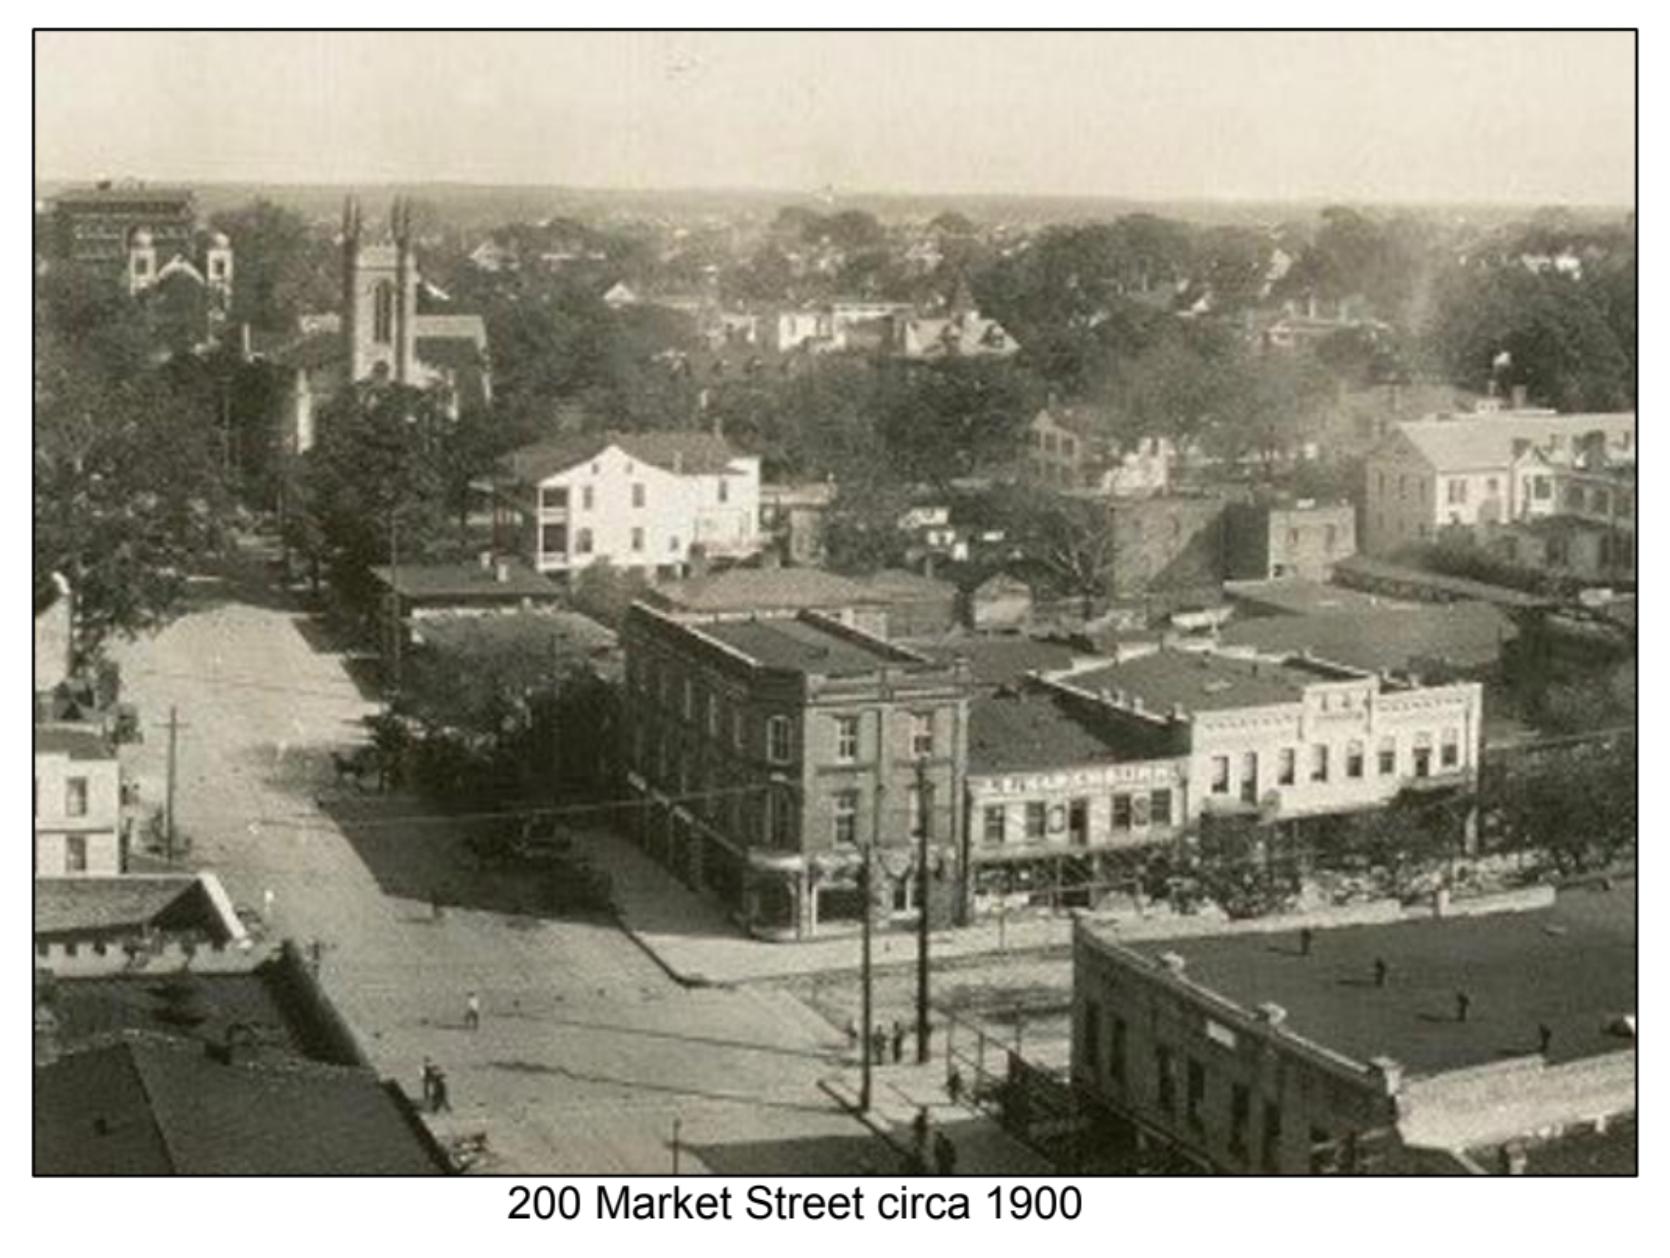 200 Market Street circa 1900